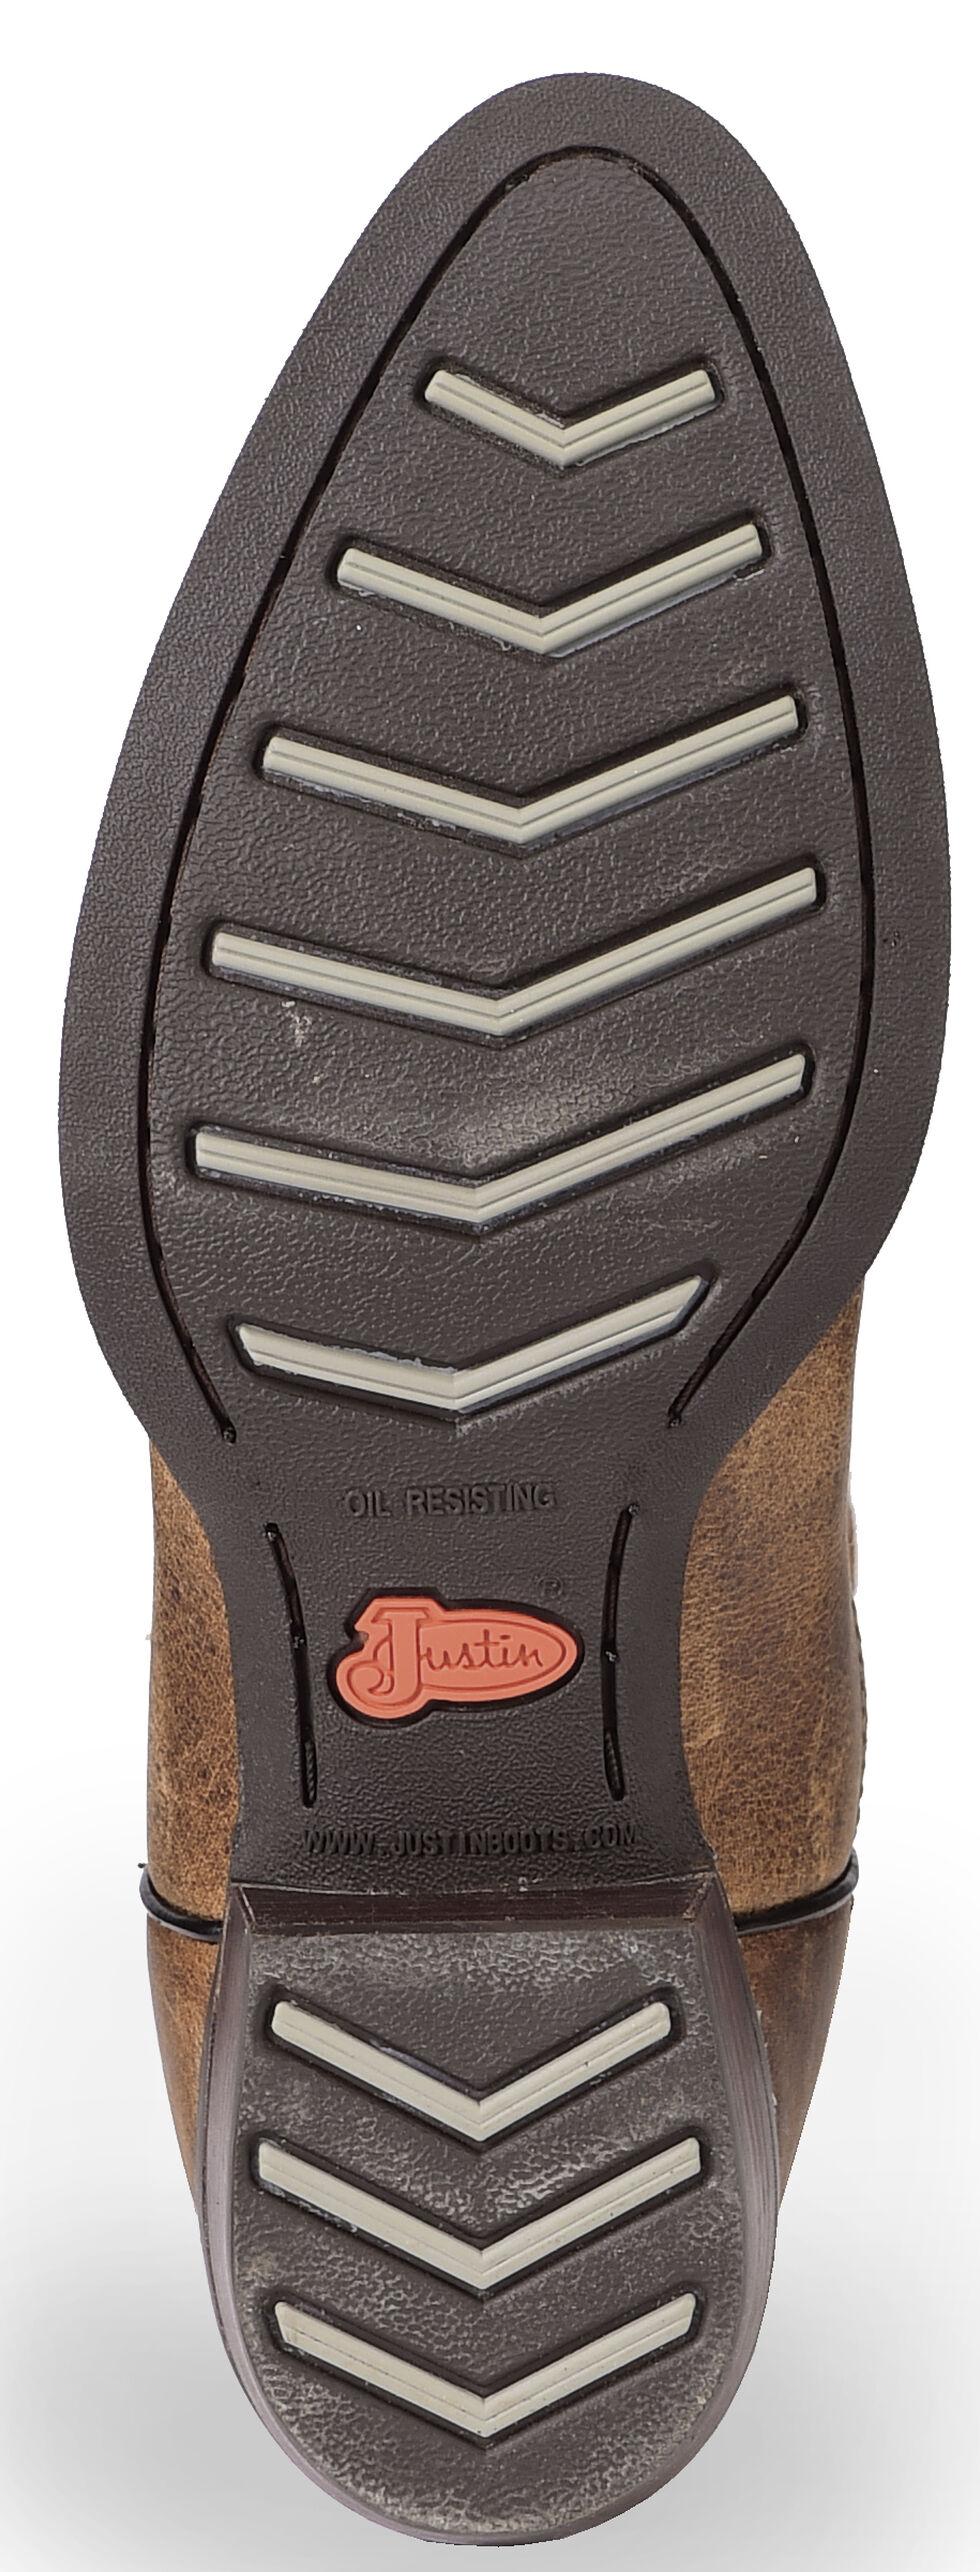 Justin Men's Silver Antique Buffalo Cowboy Boots - Medium Toe, Antique Brown, hi-res